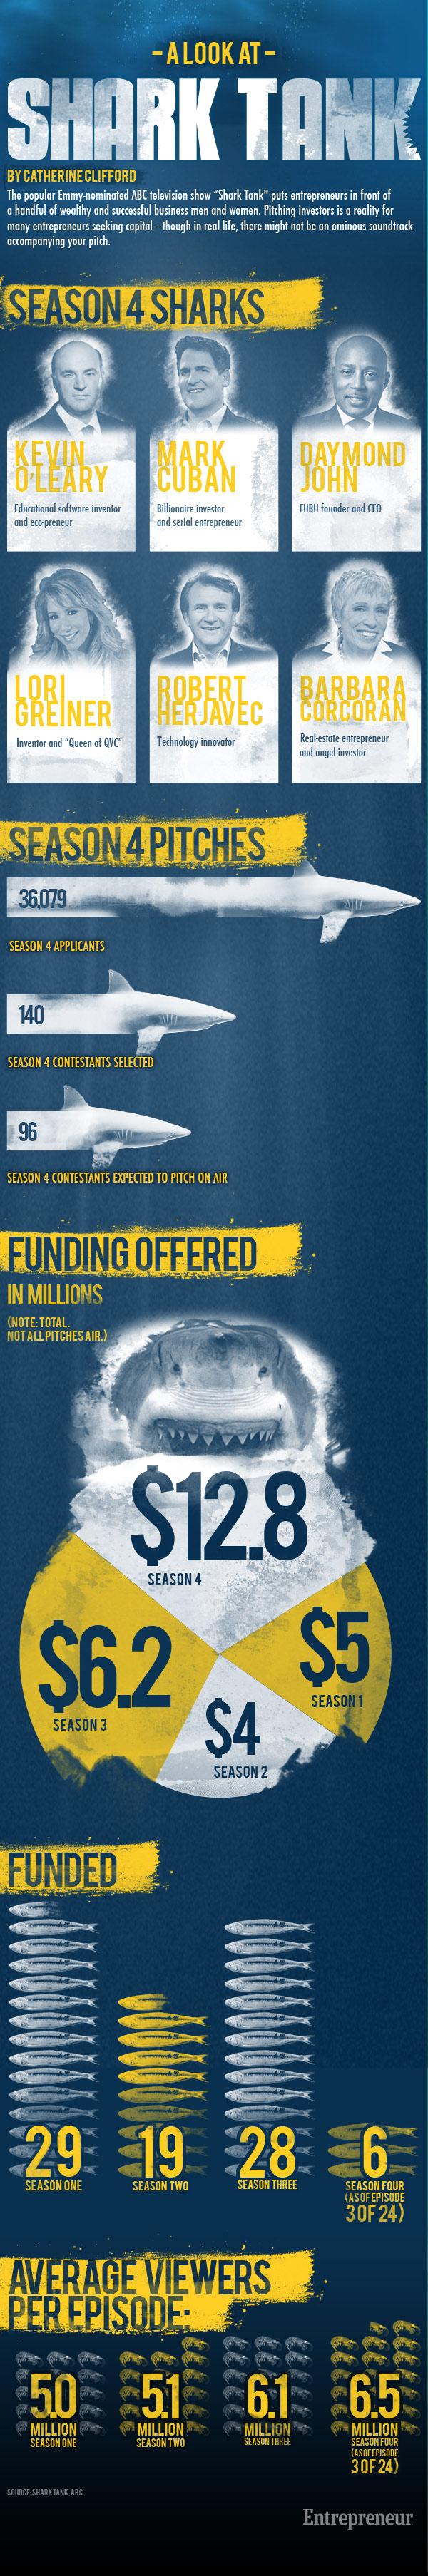 Shark-tank-infographic